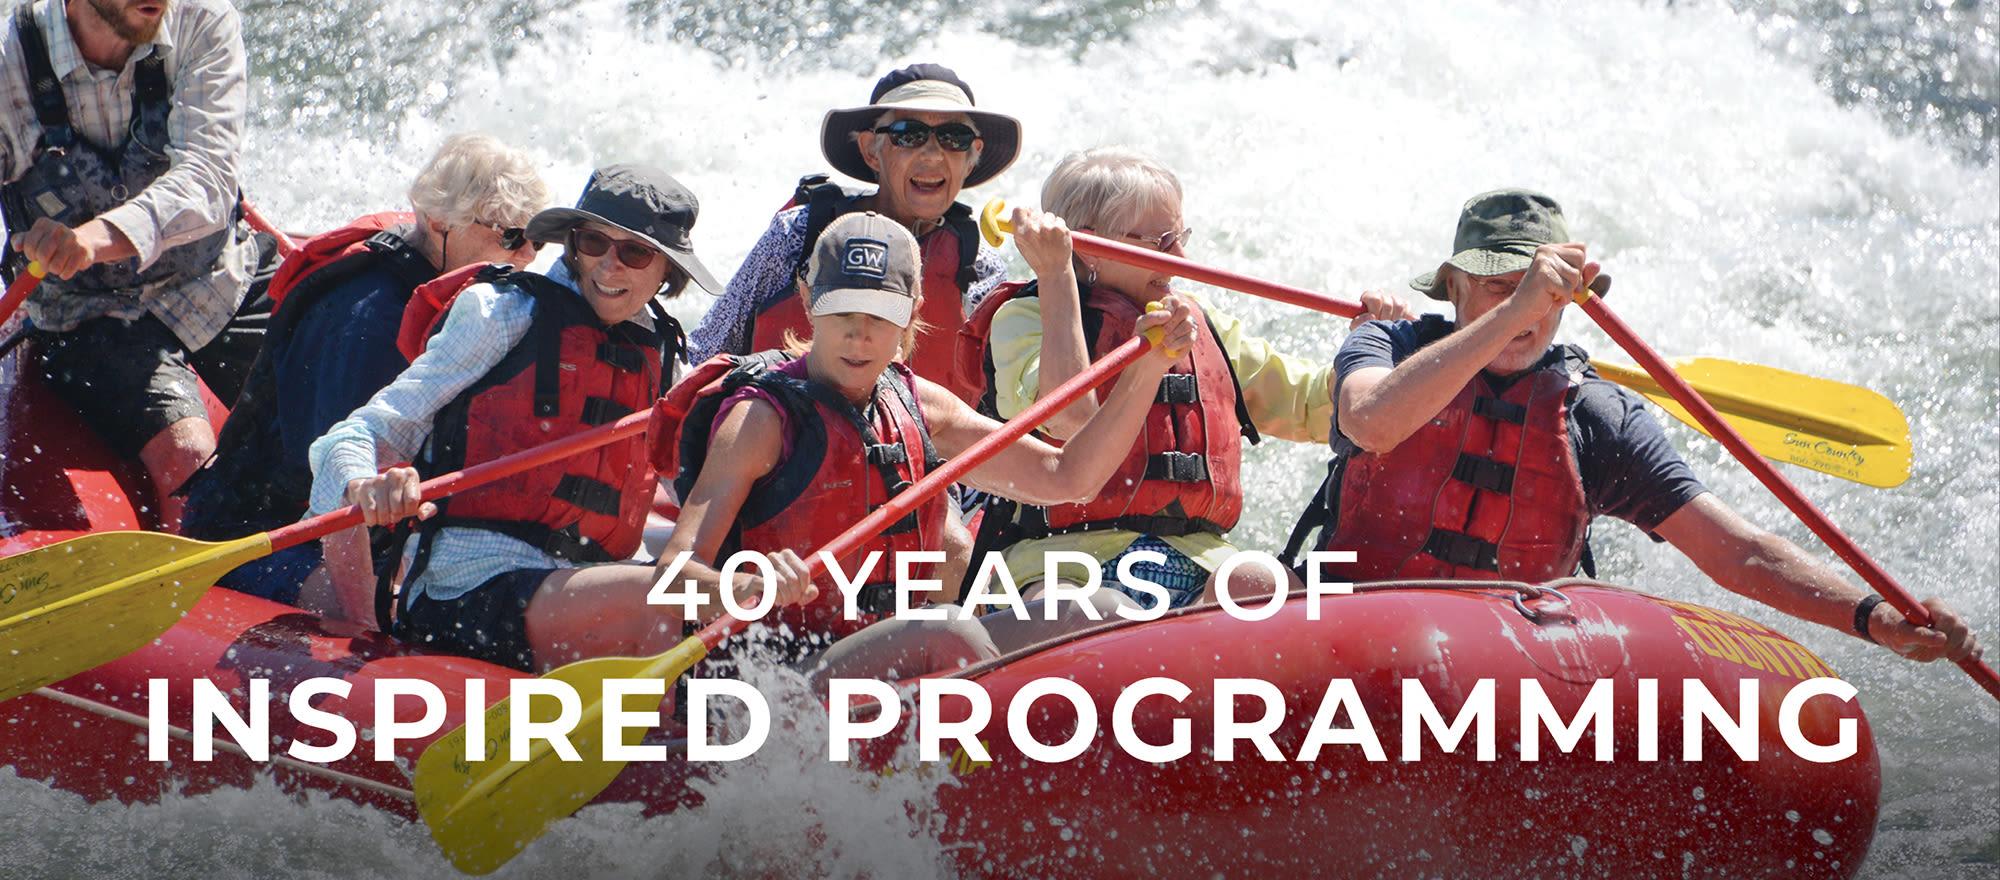 40 Years of Inspired Programming